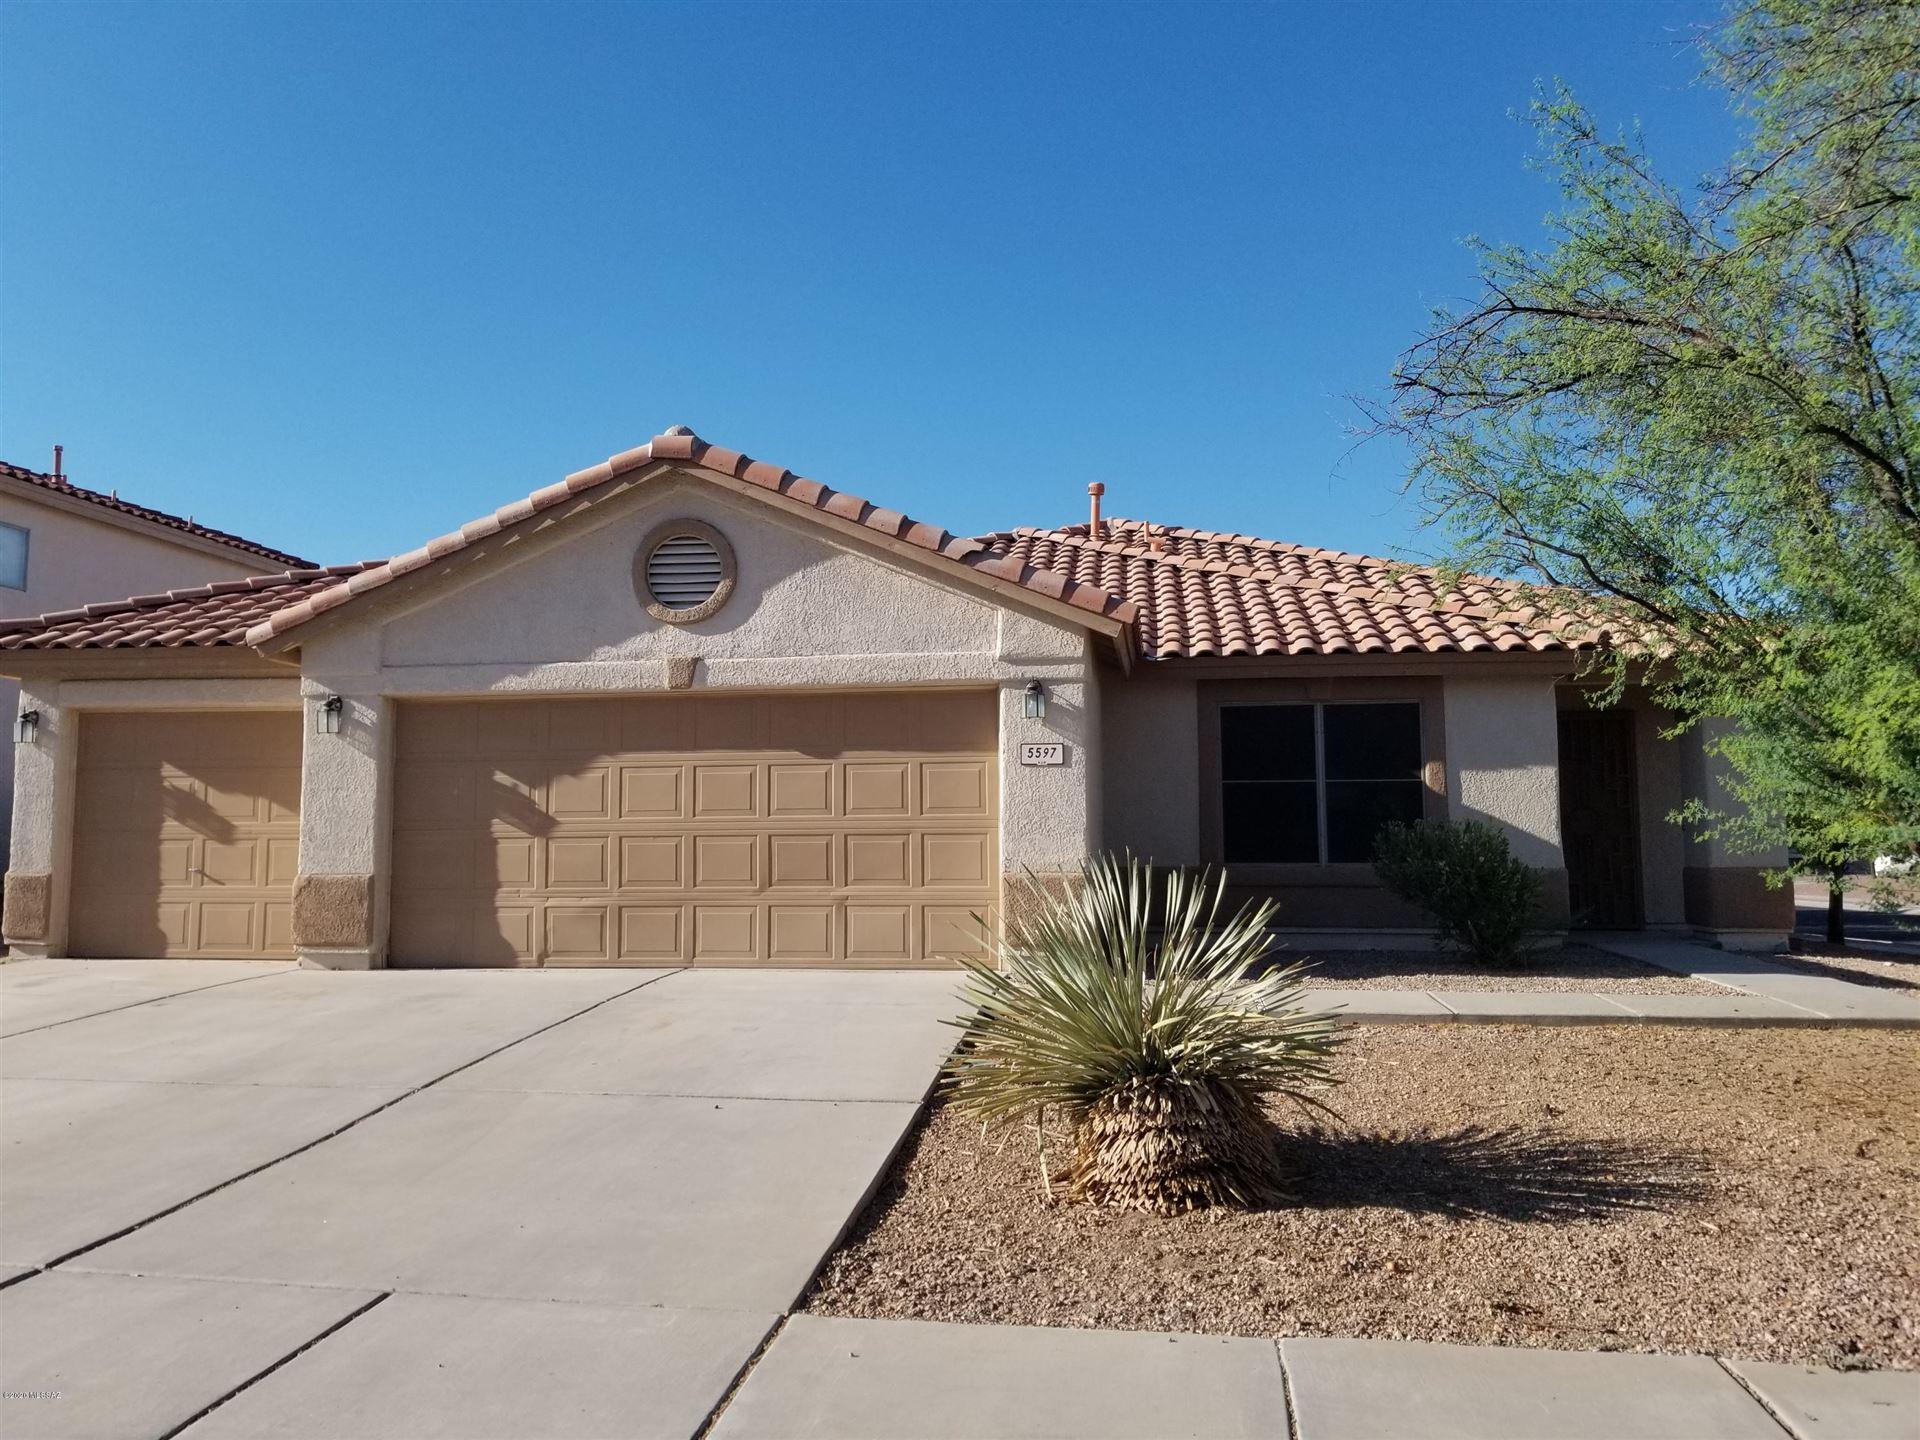 5597 W Shady Grove Drive, Tucson, AZ 85742 - #: 22016727